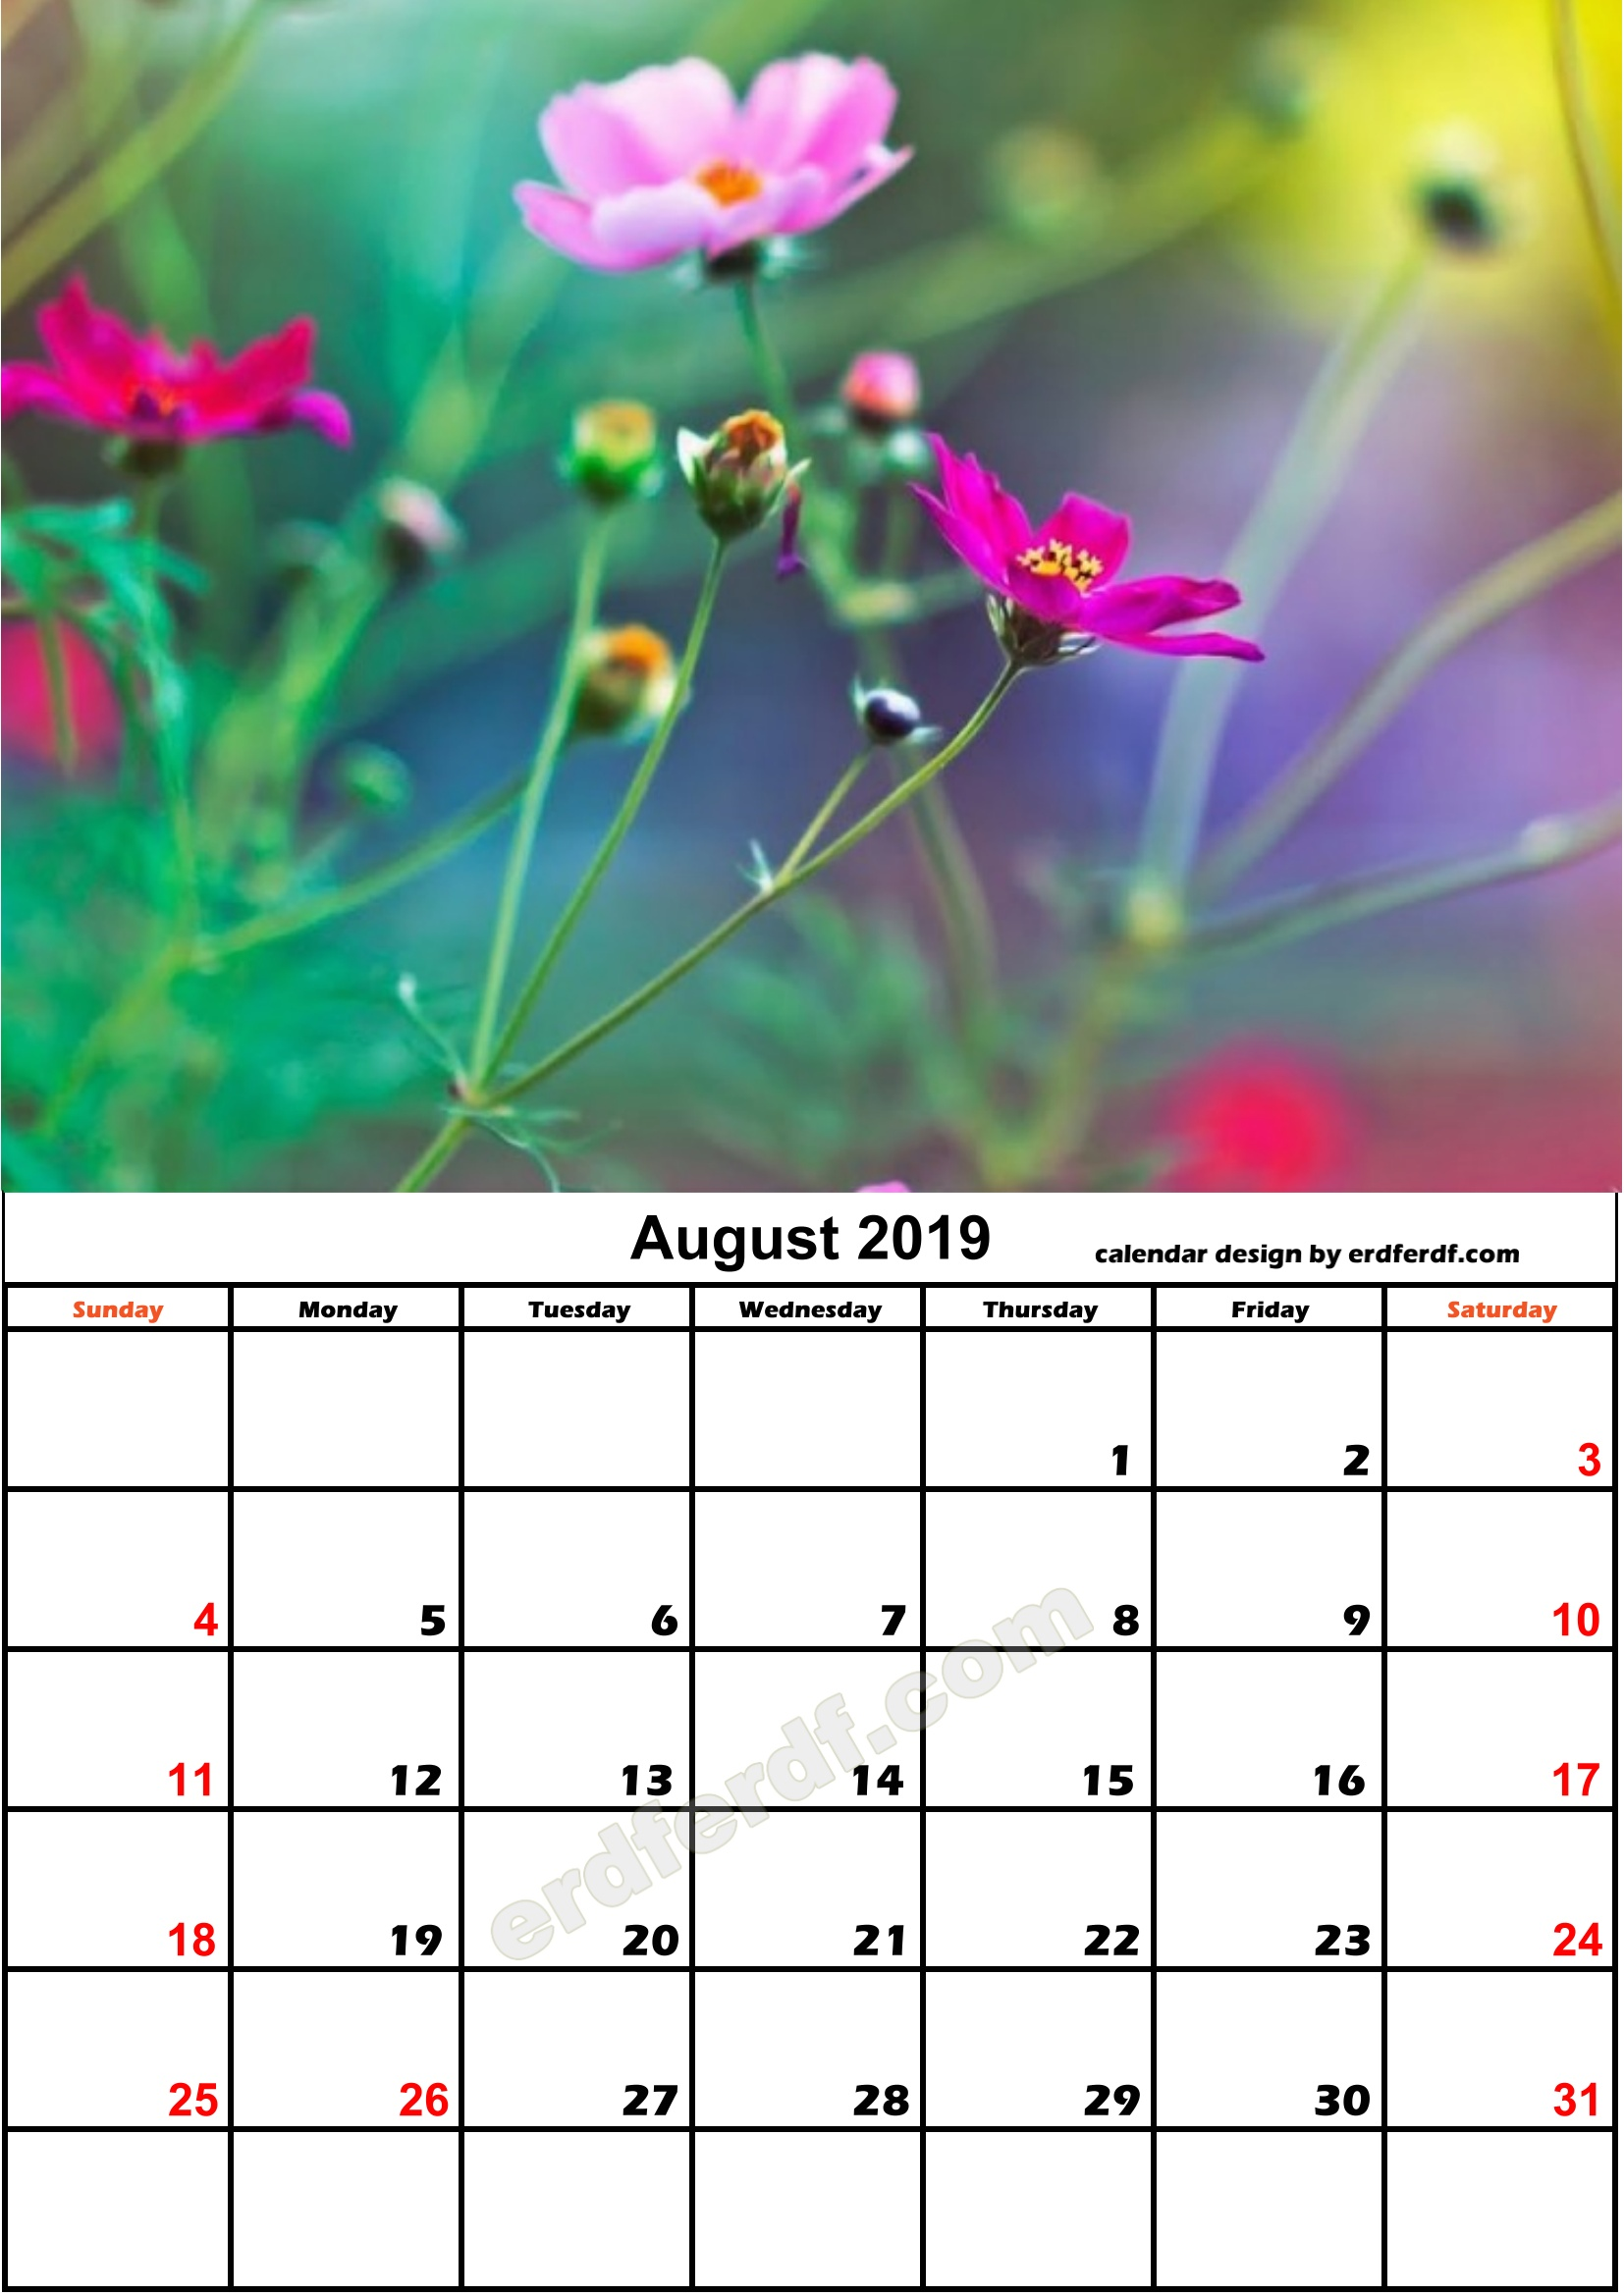 8 Flower August Calendar Nature Calendar Monthly 2019 Free Download